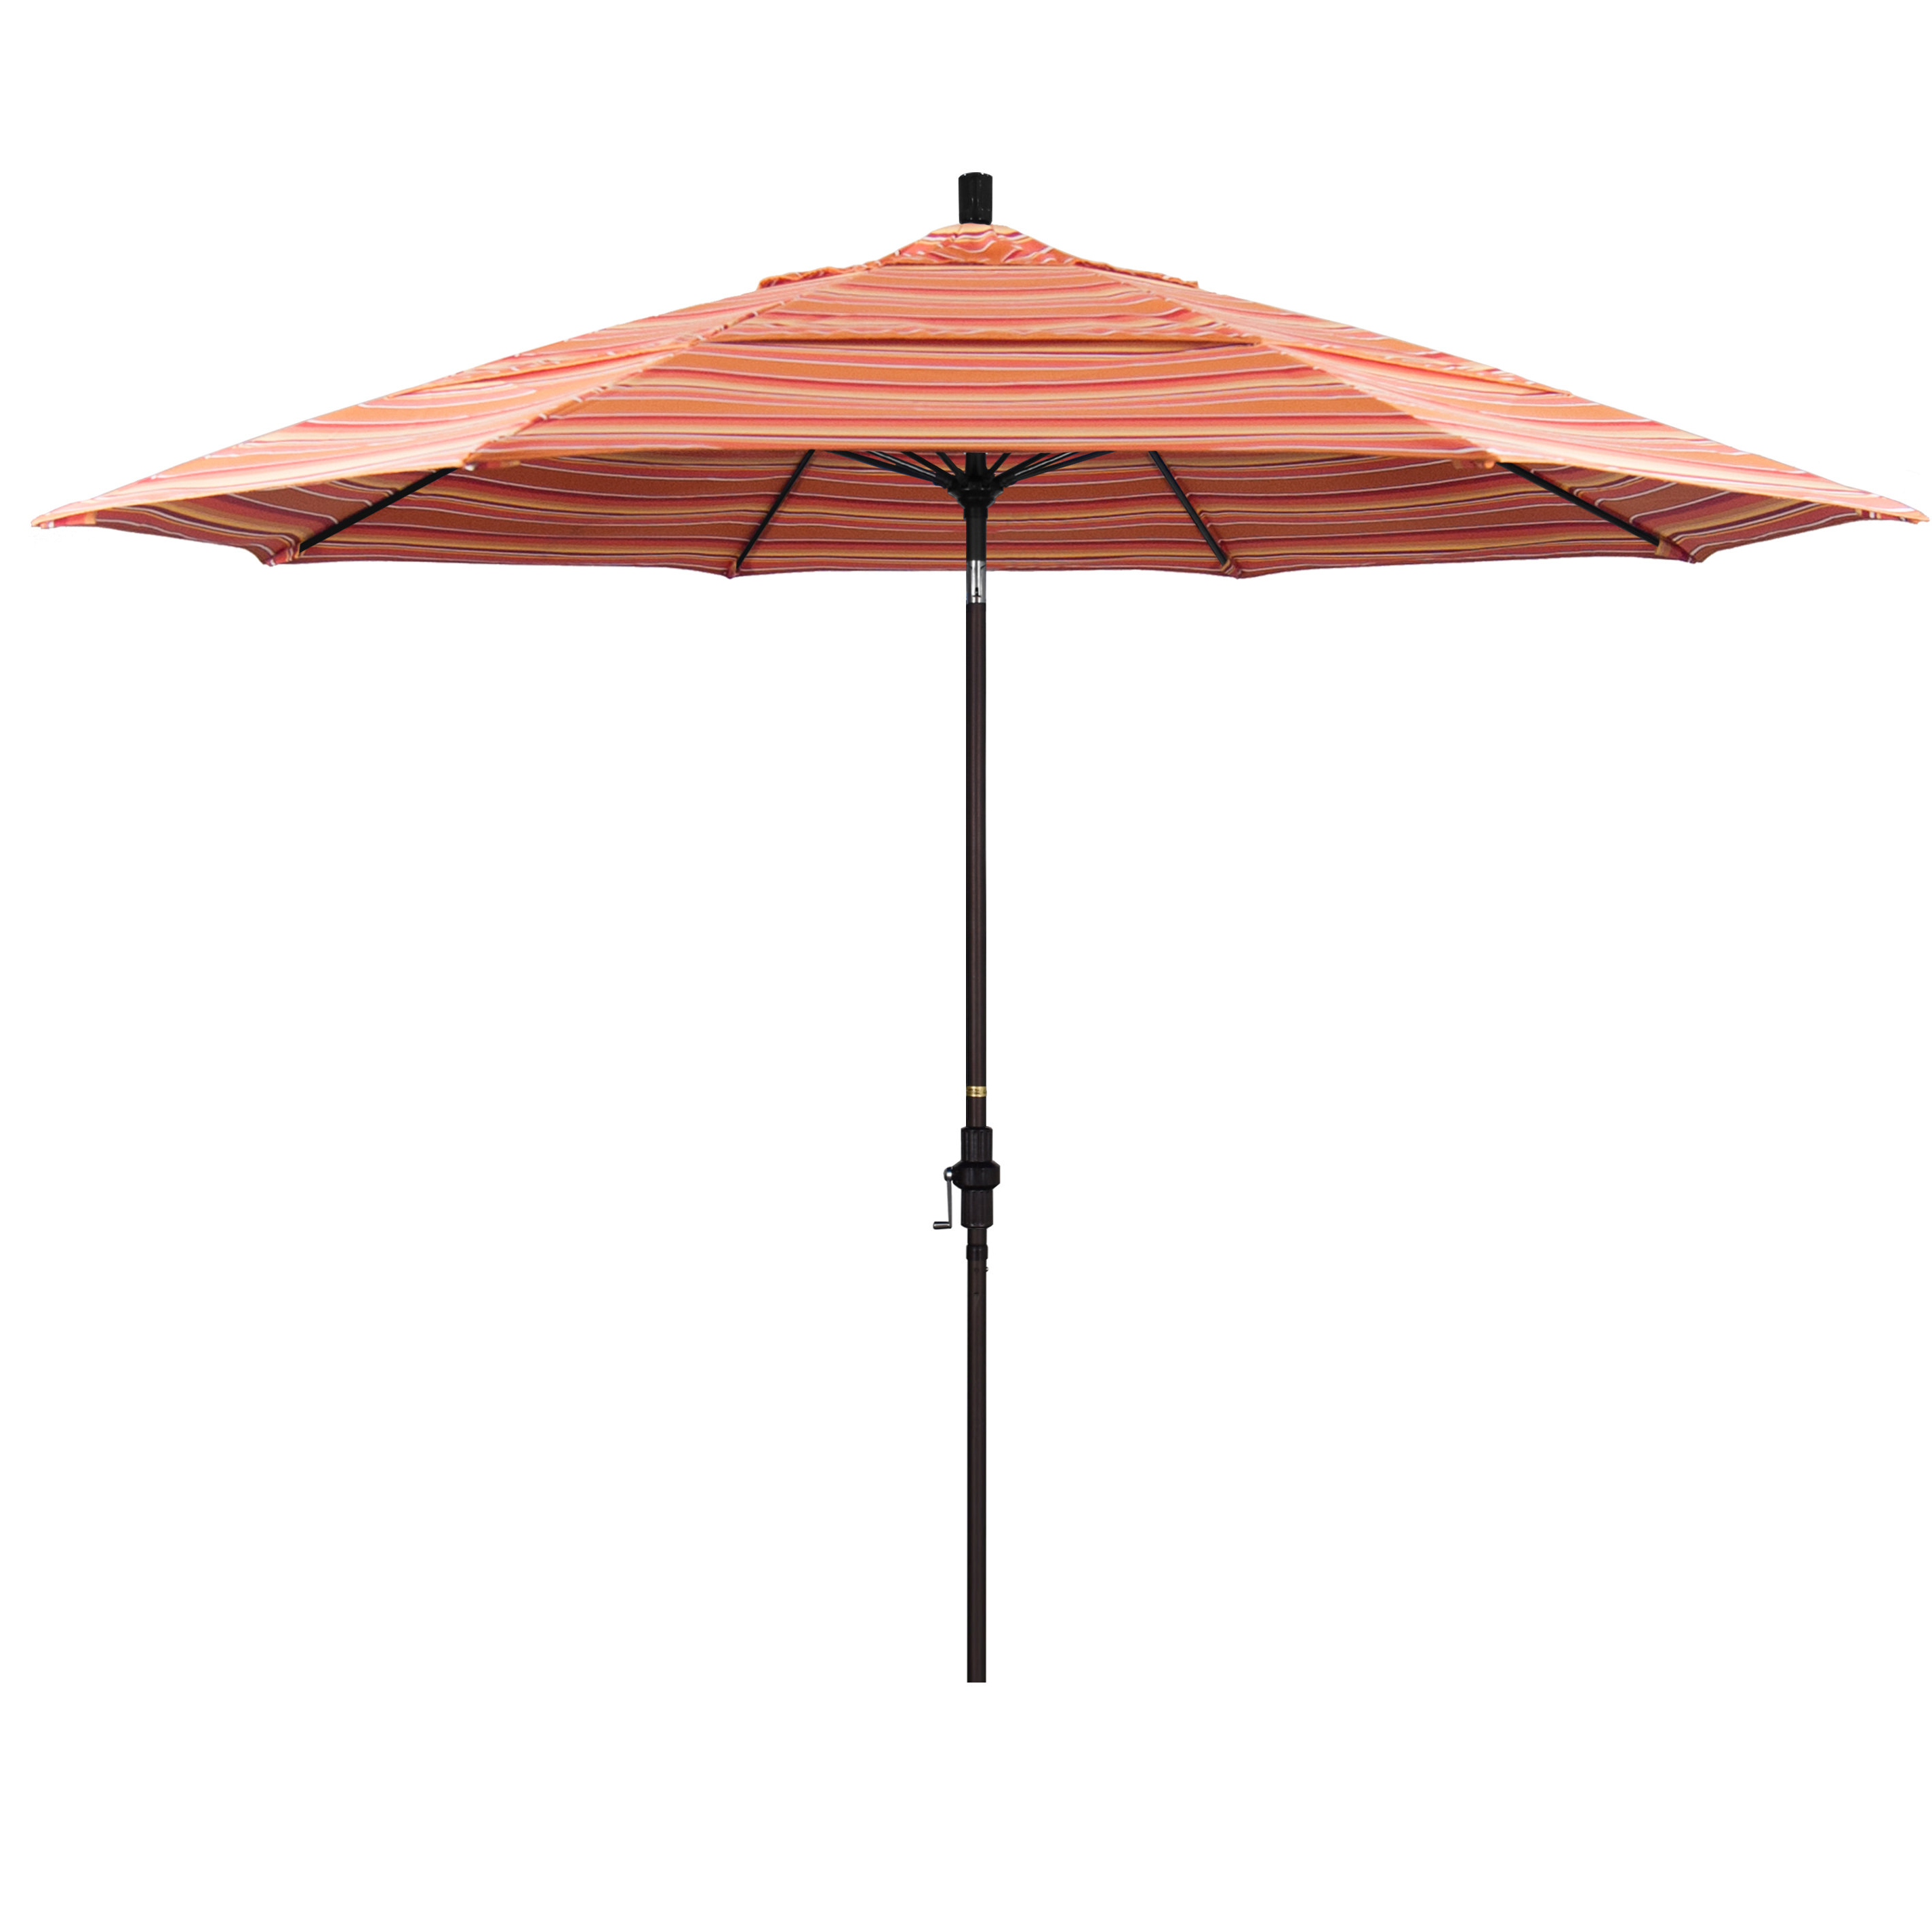 Widely Used Muldoon 11' Market Sunbrella Umbrella In Wiebe Auto Tilt Square Market Sunbrella Umbrellas (View 10 of 20)